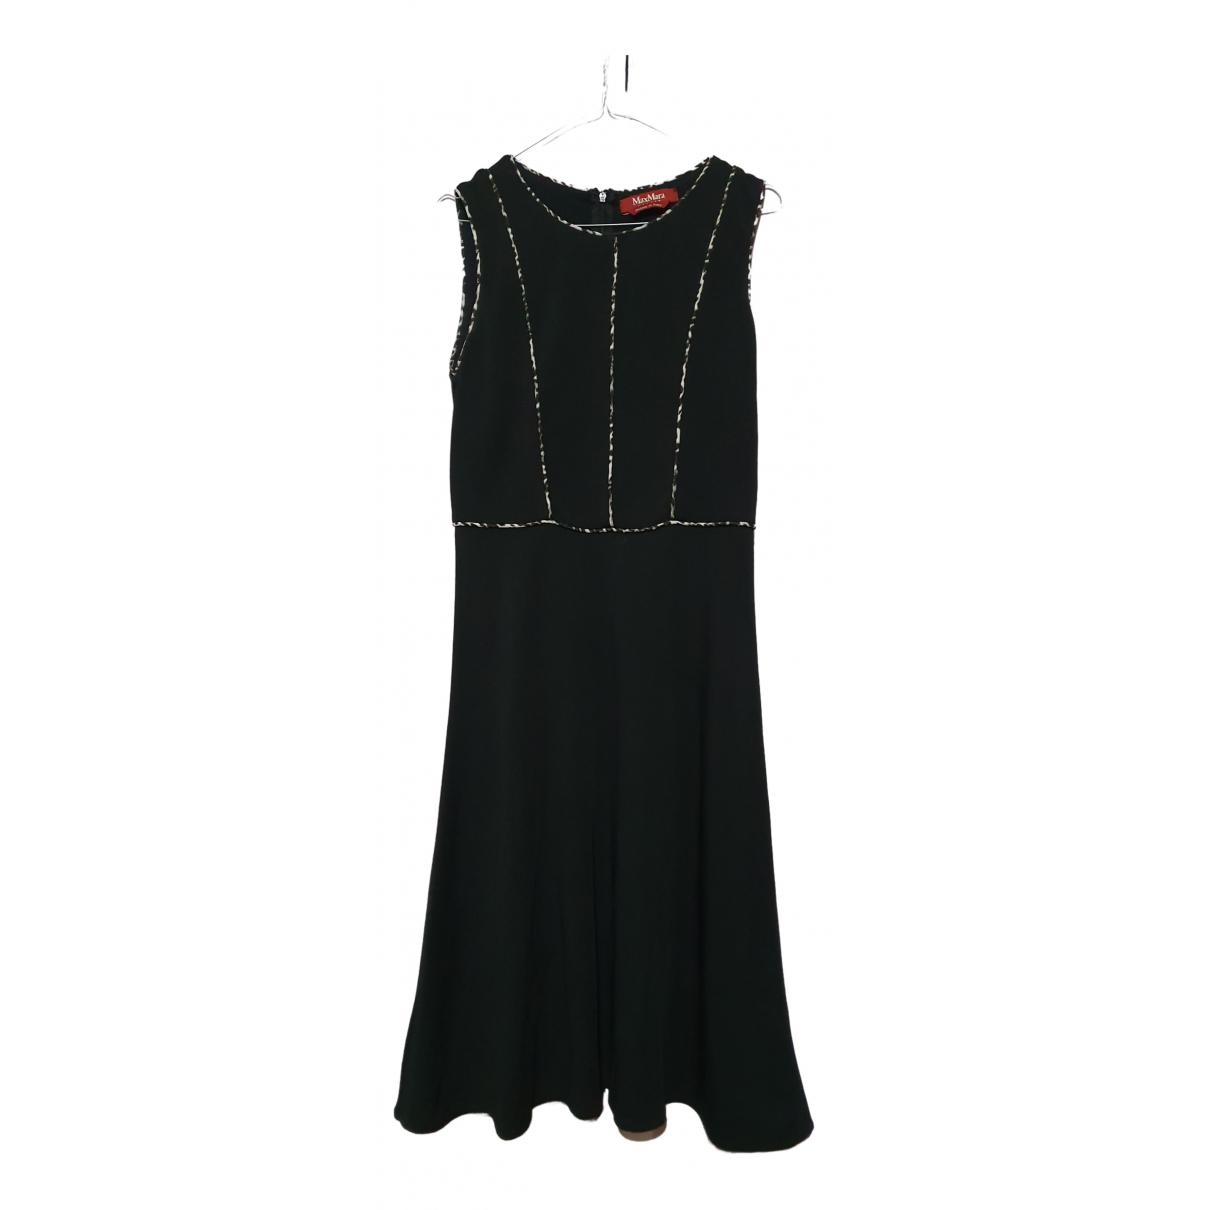 Max Mara Studio \N Kleid in  Schwarz Polyester